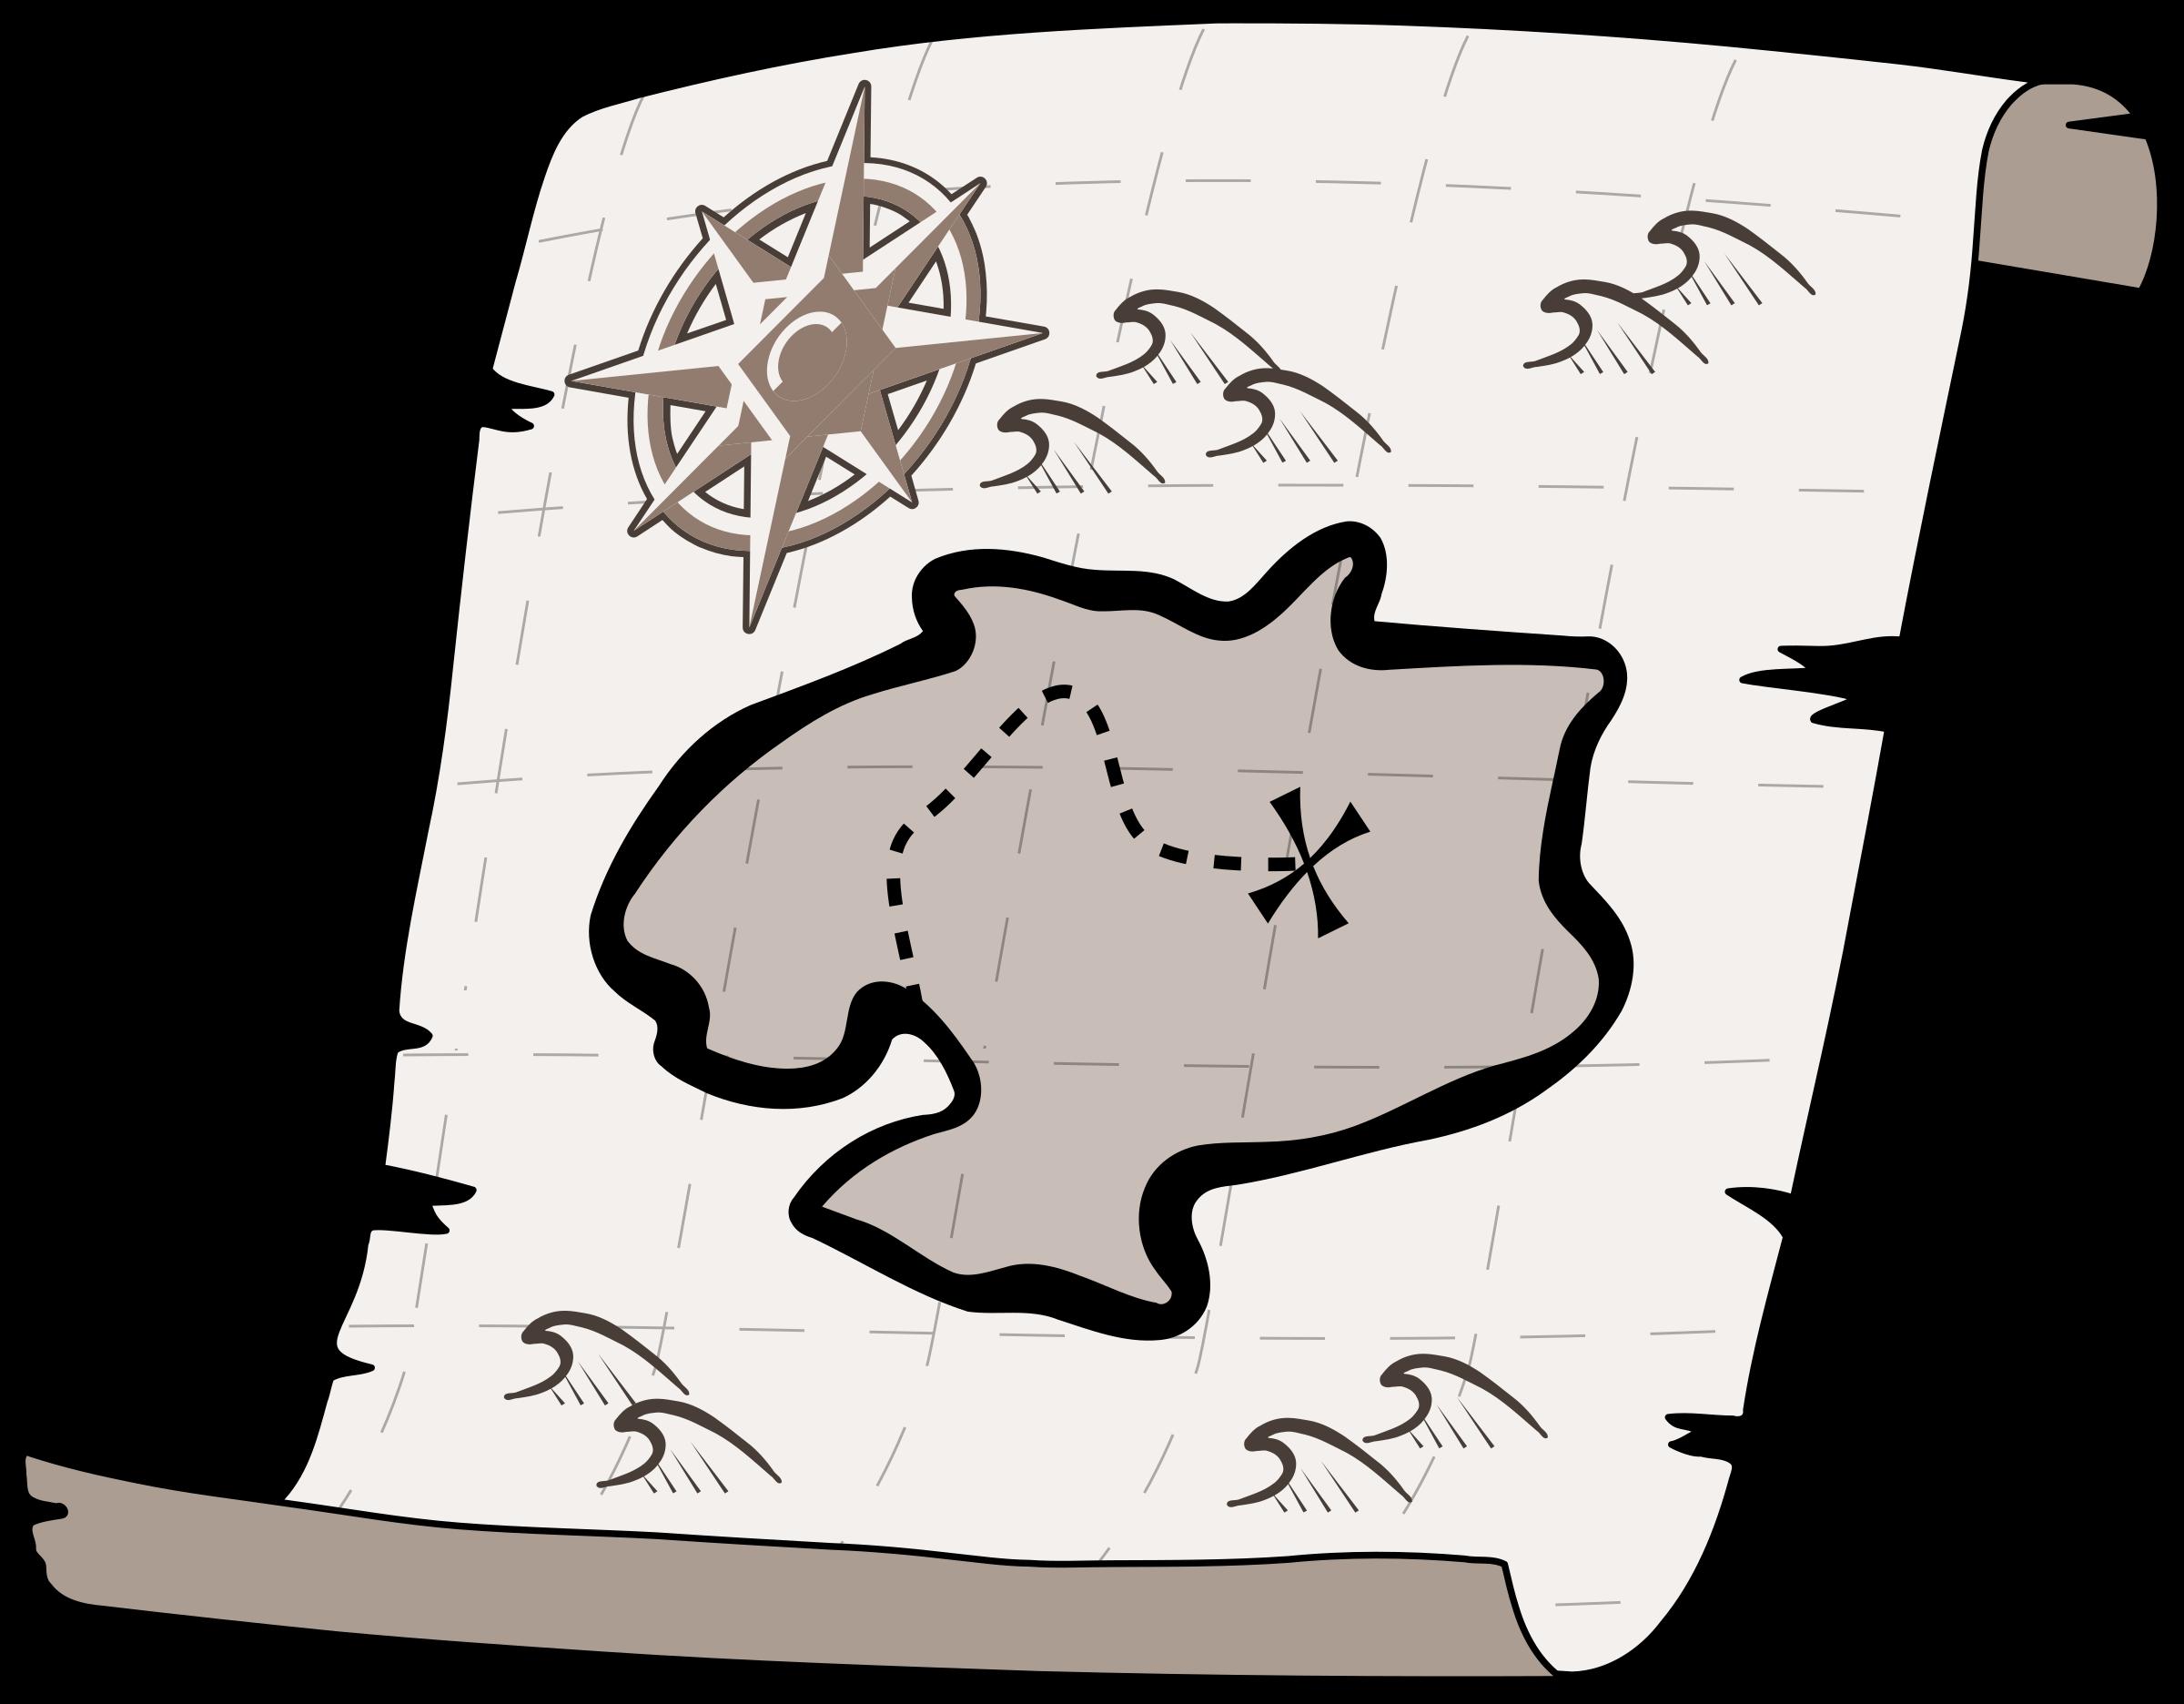 Treasure map big image. Win clipart black and white